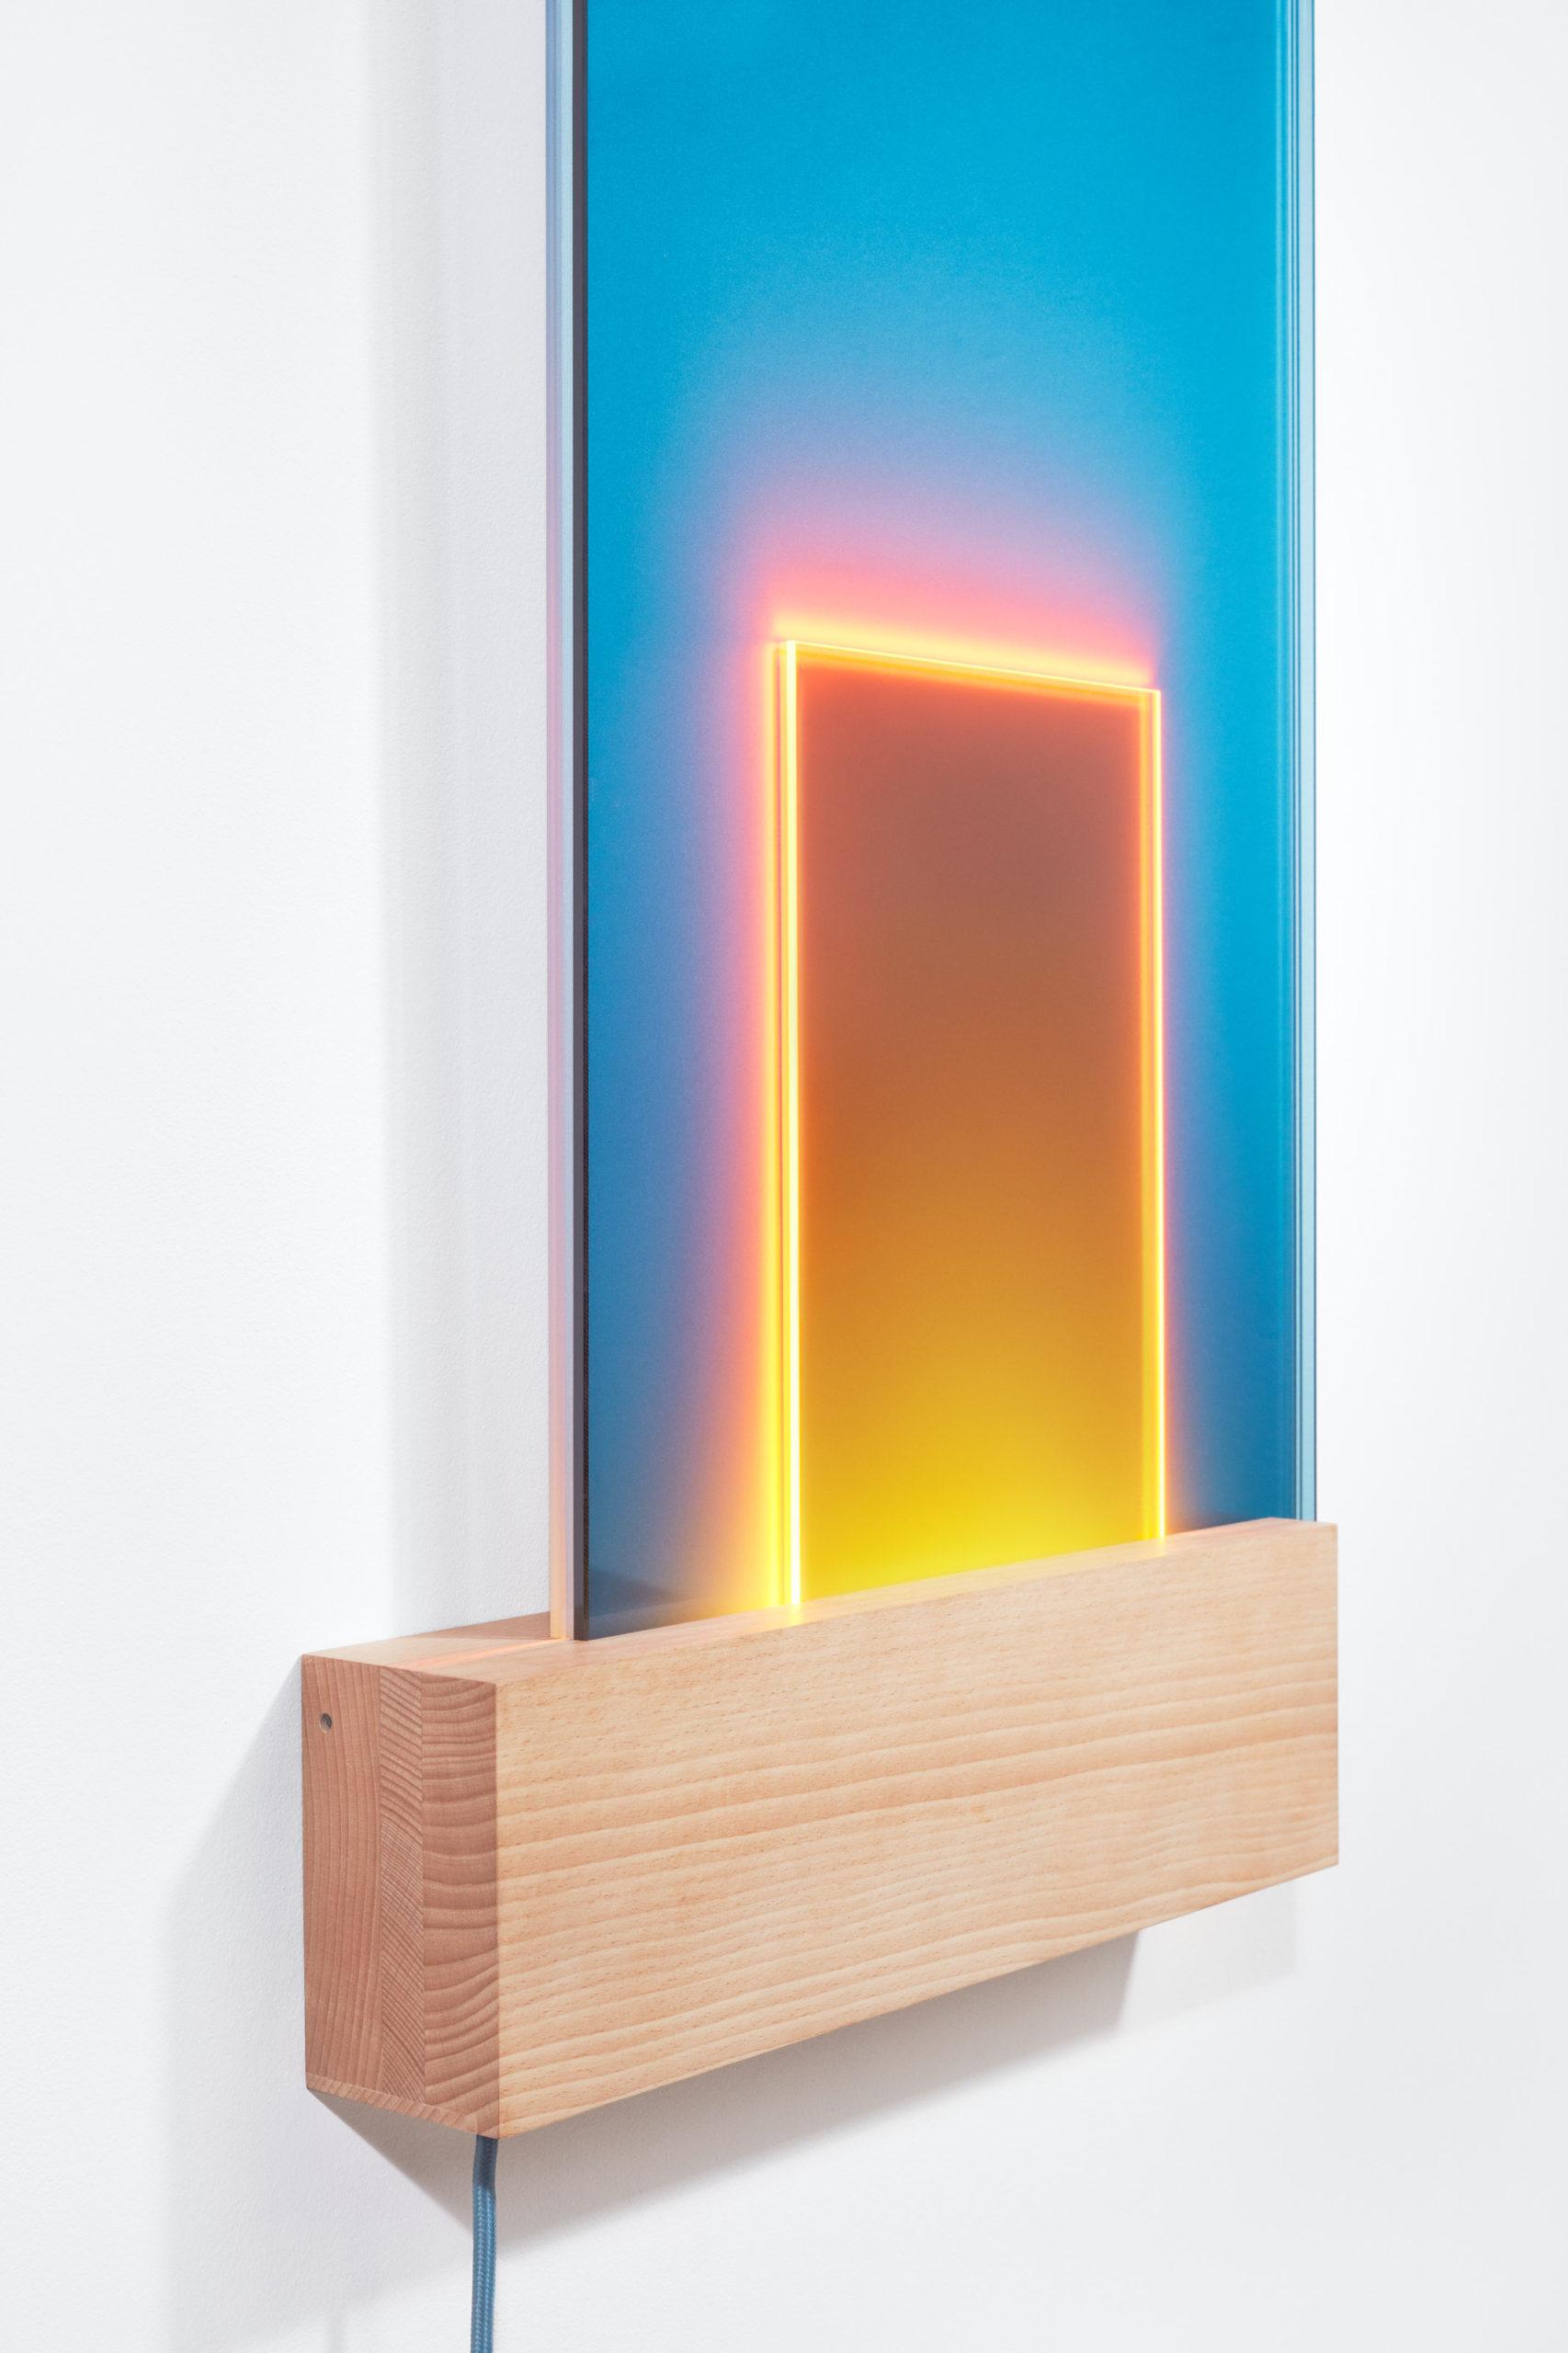 LIUW I – Studio Hedwich Hooghiemstra